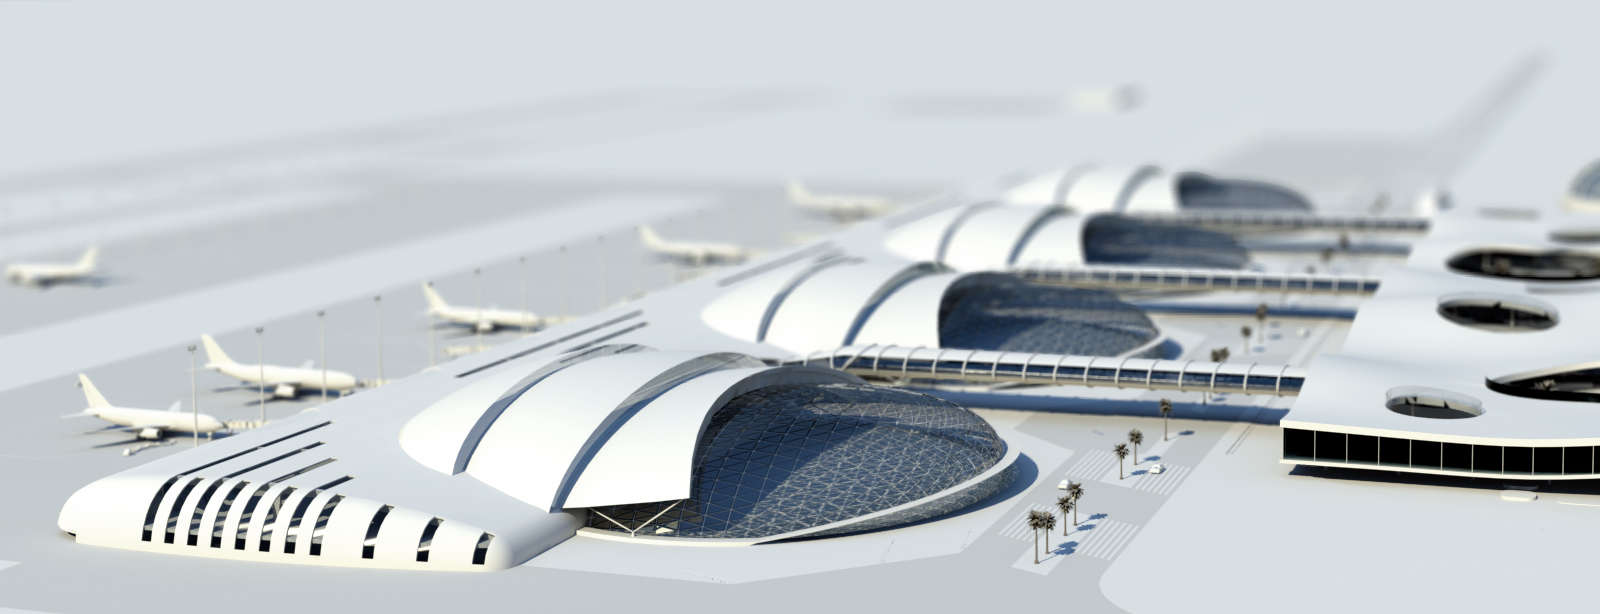 Aeropuerto-Jartum_01